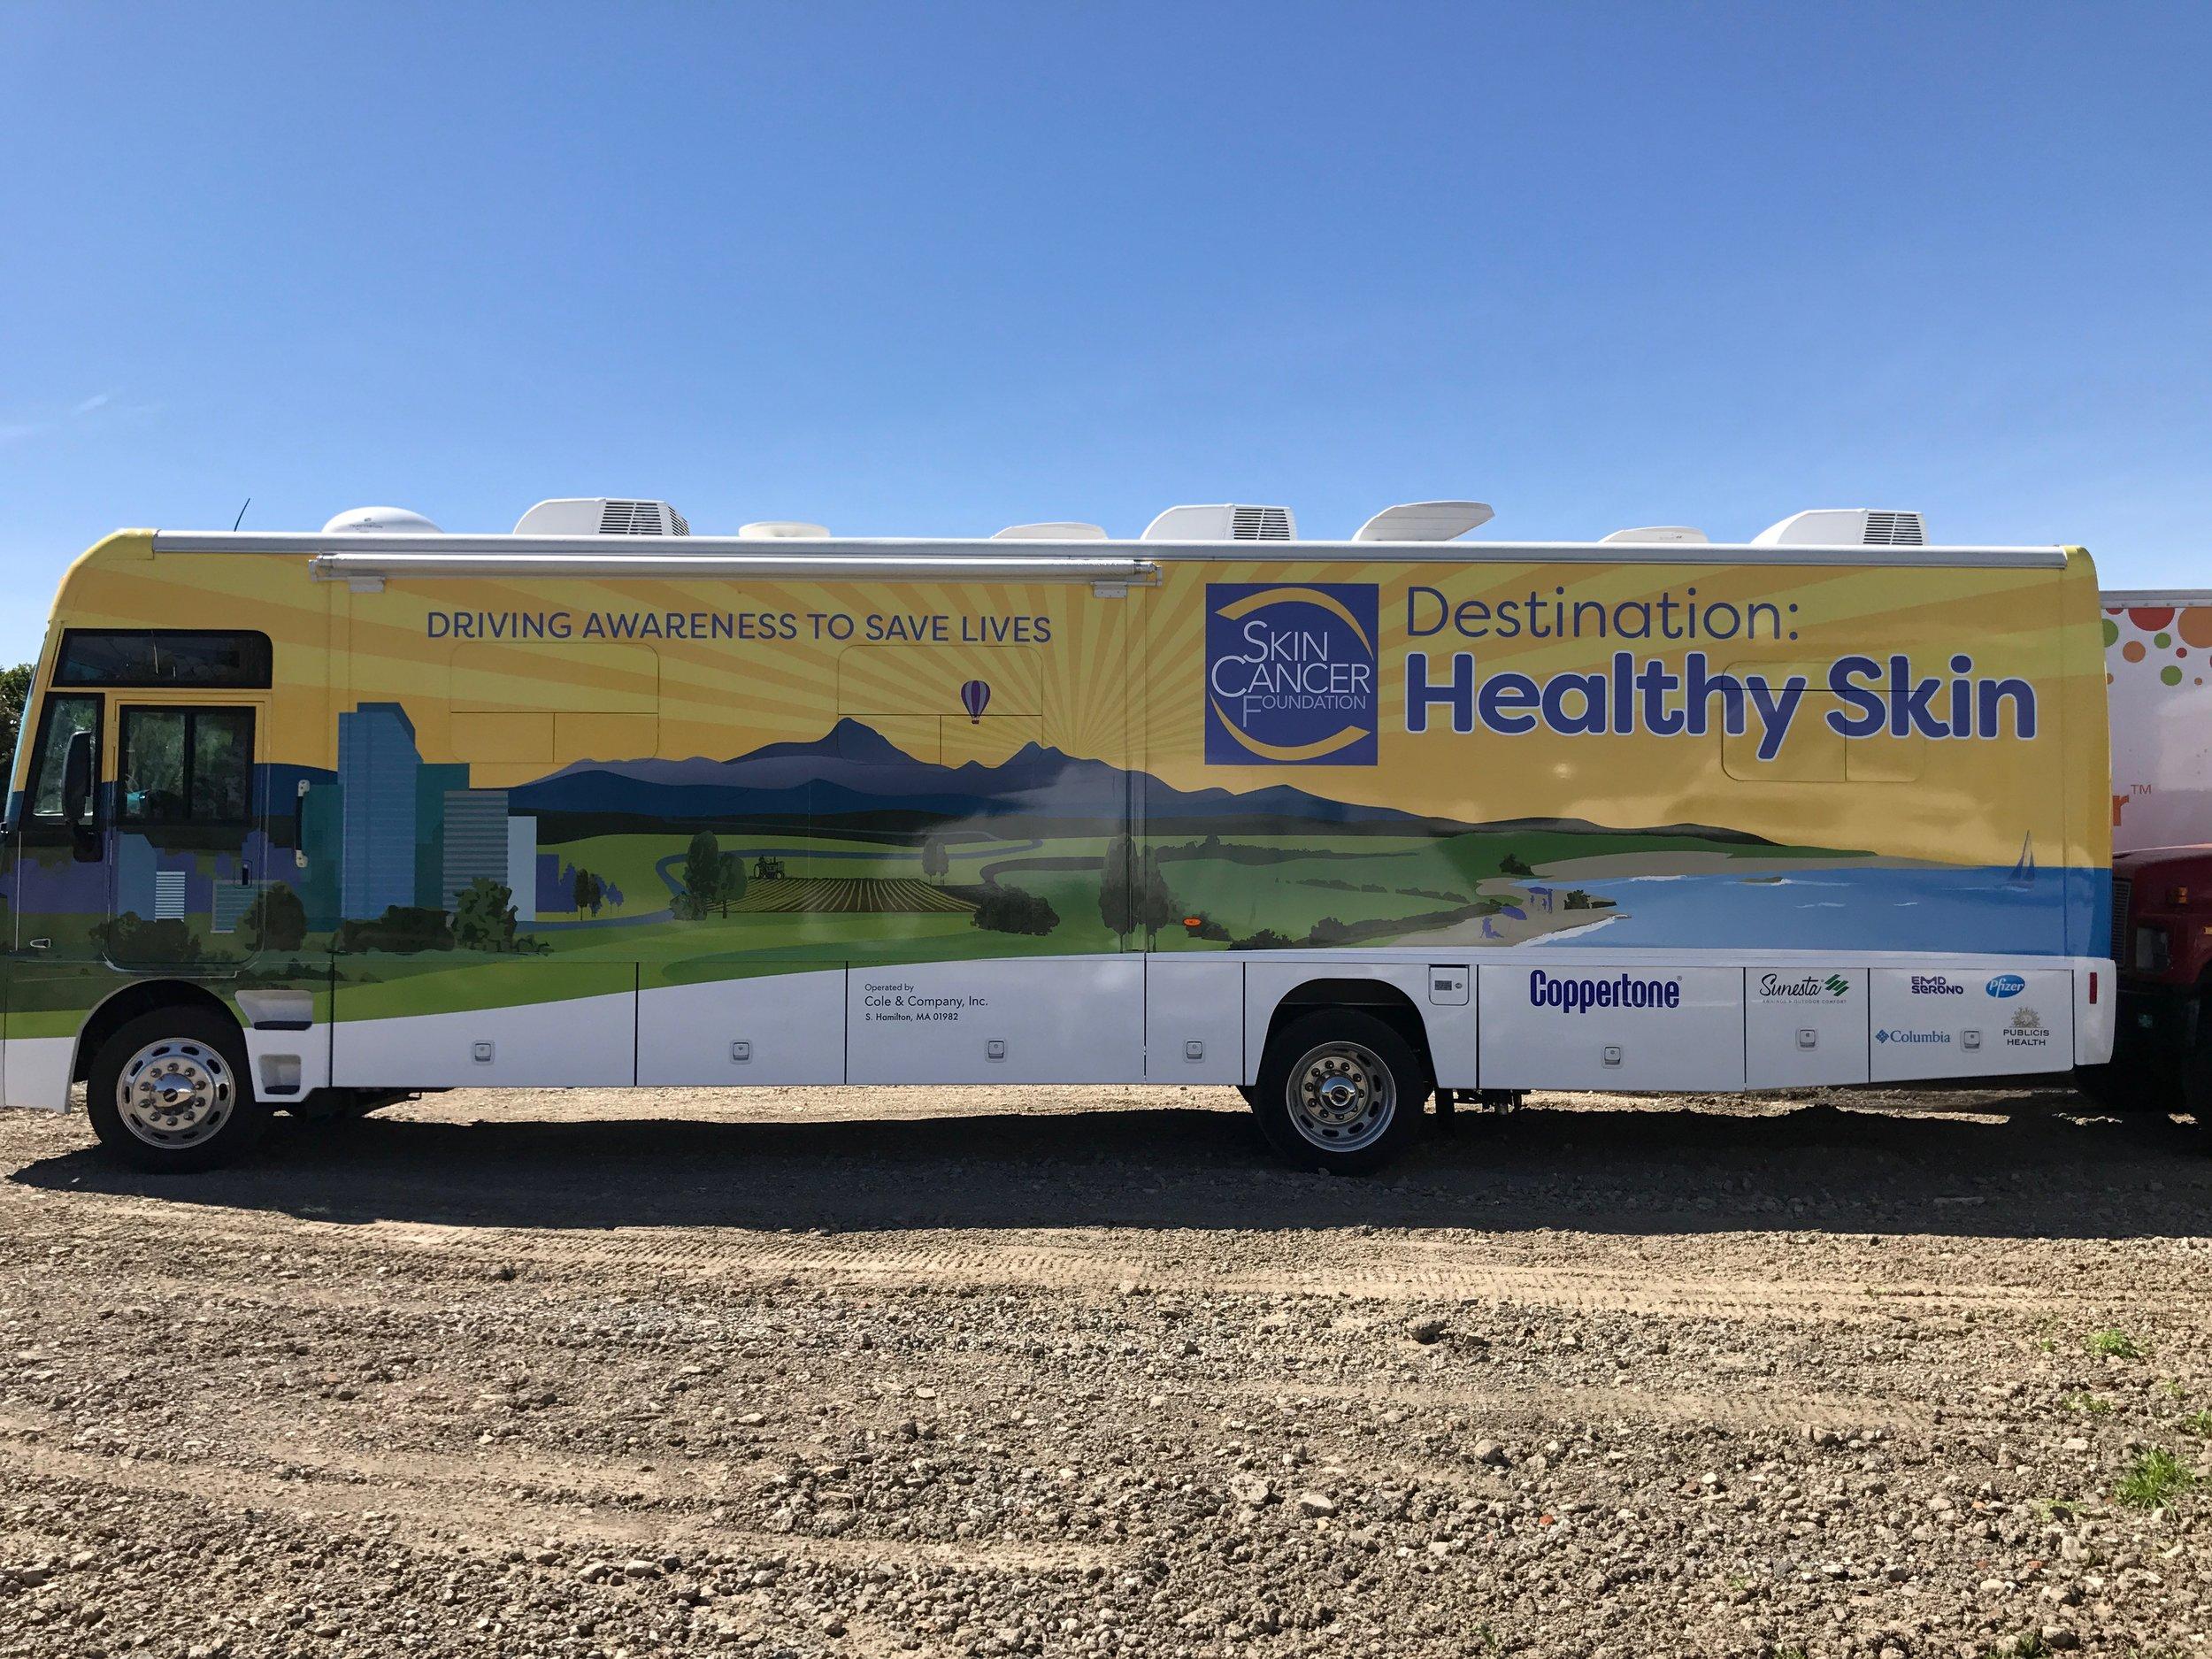 Skin Cancer Foundation Destination Healthy Skin Tour Bus